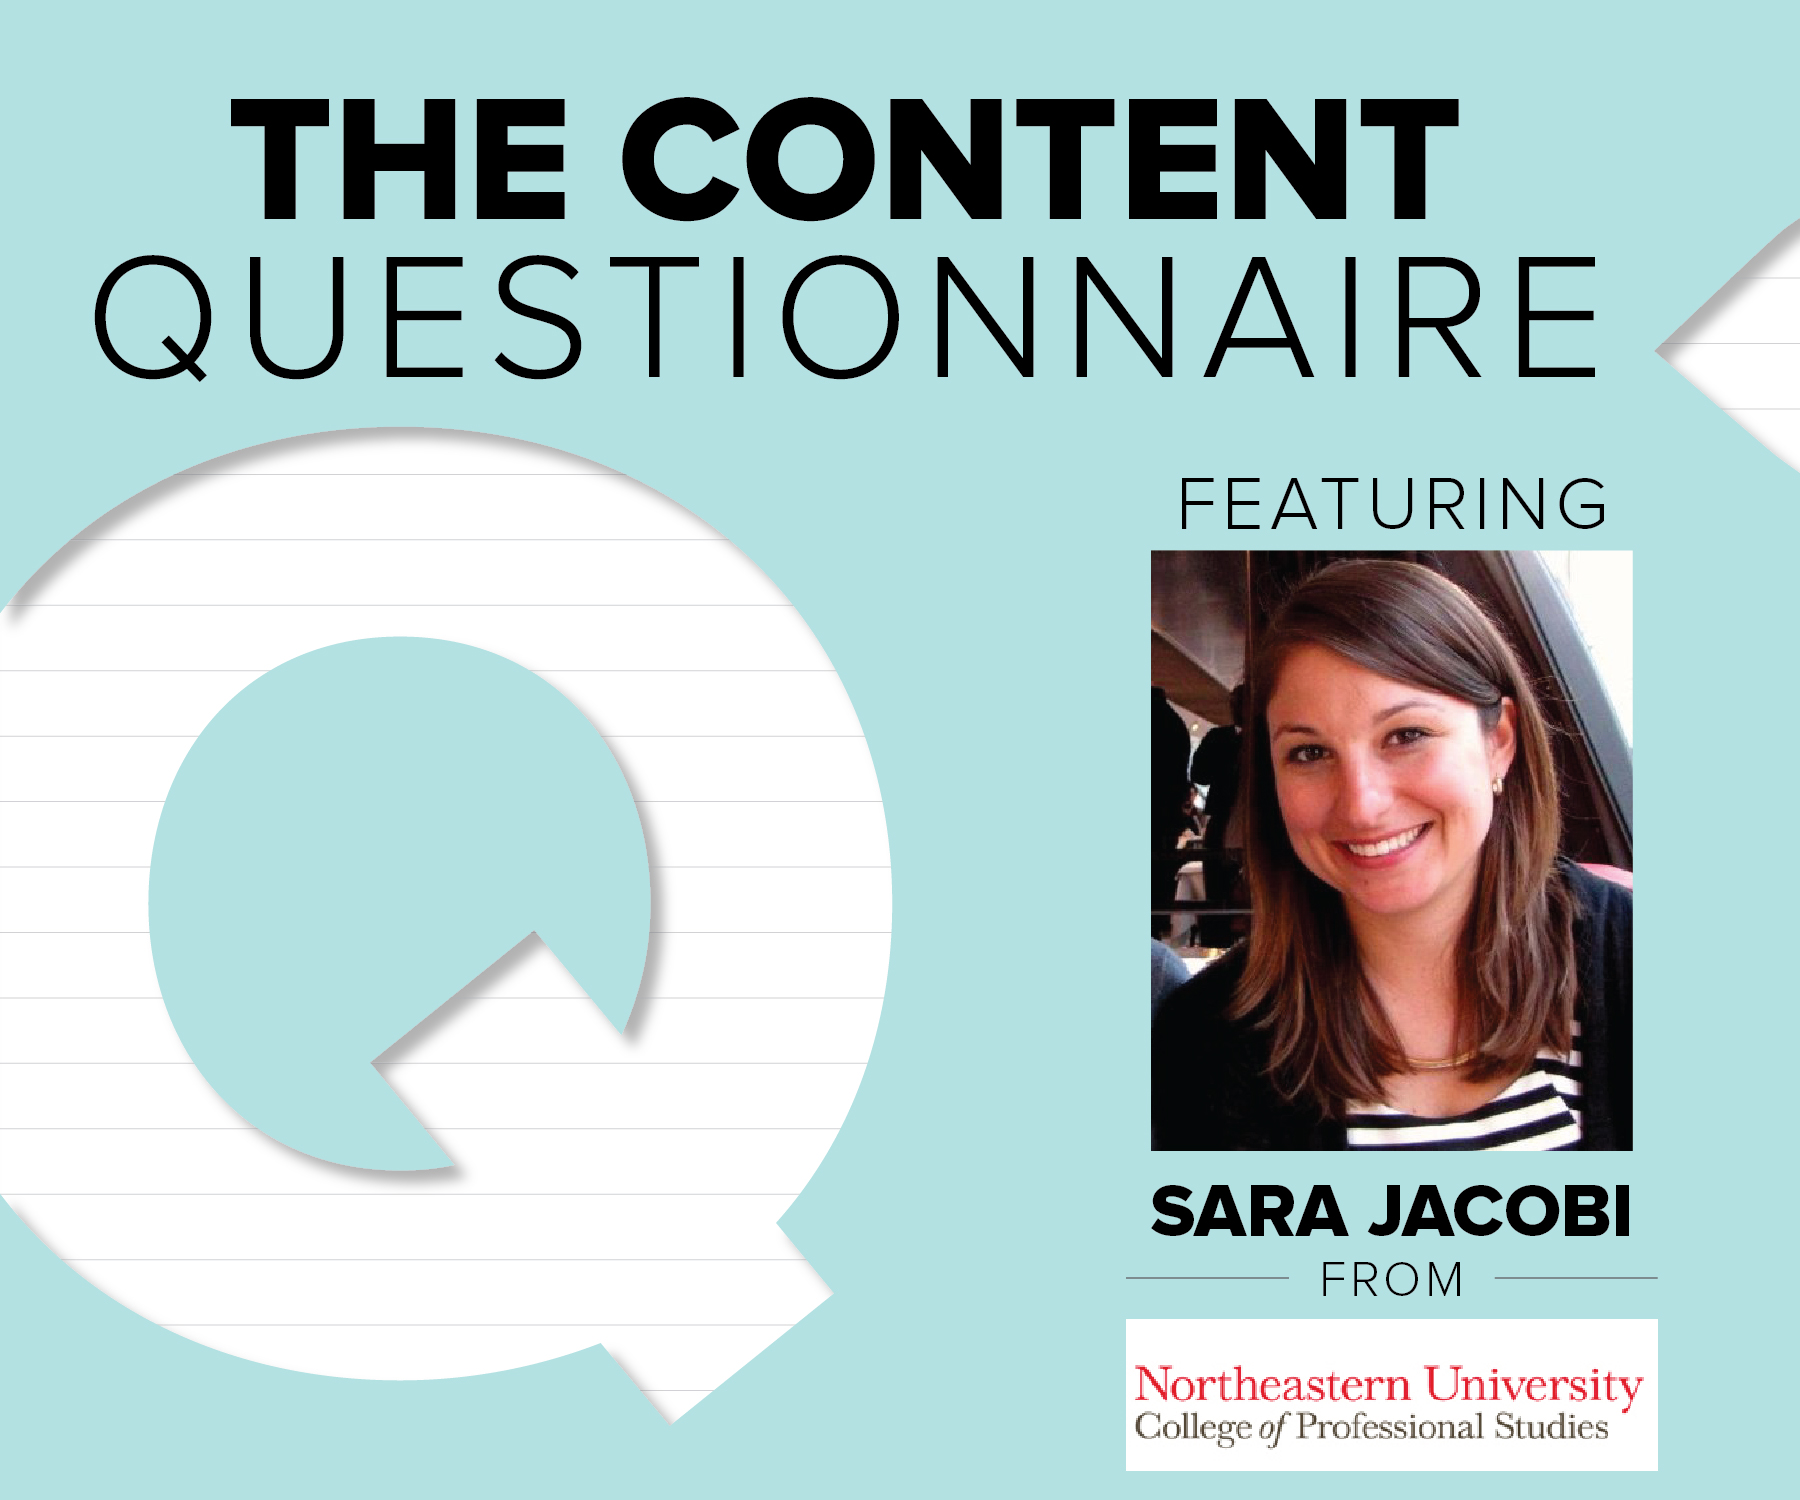 Sara Jacobi Northeastern